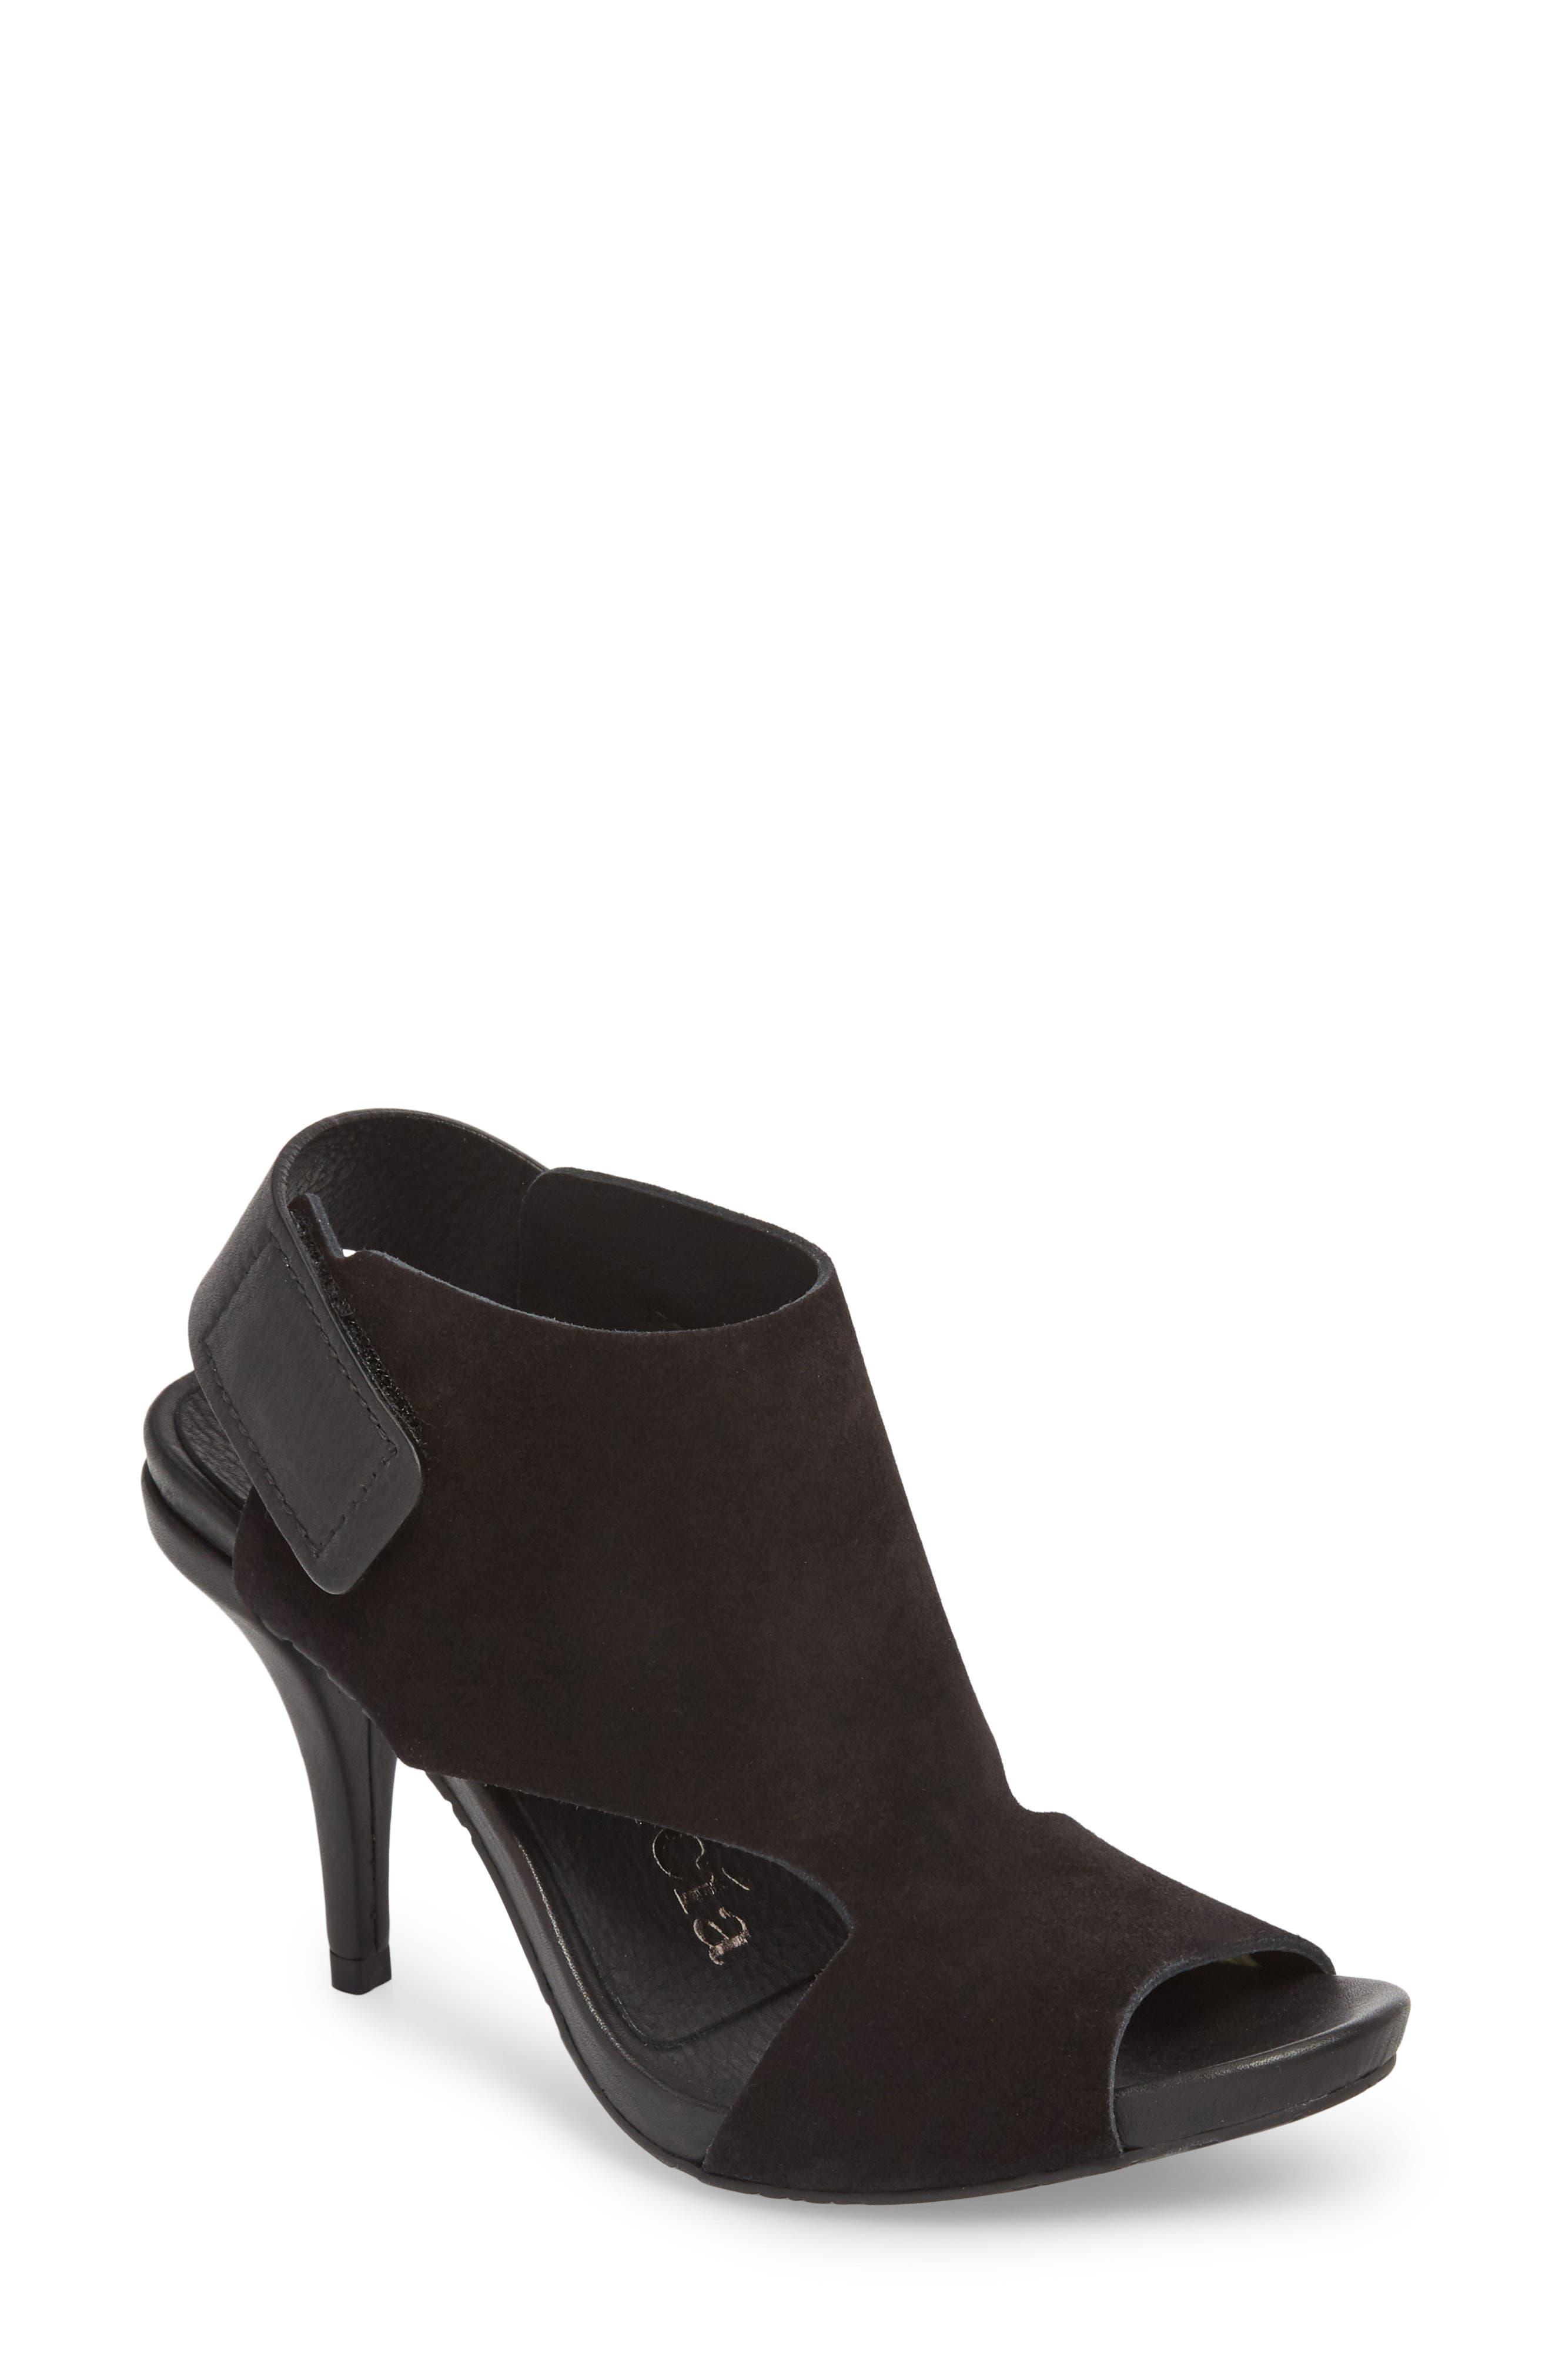 Yimina Cutout Sandal,                             Main thumbnail 1, color,                             BLACK